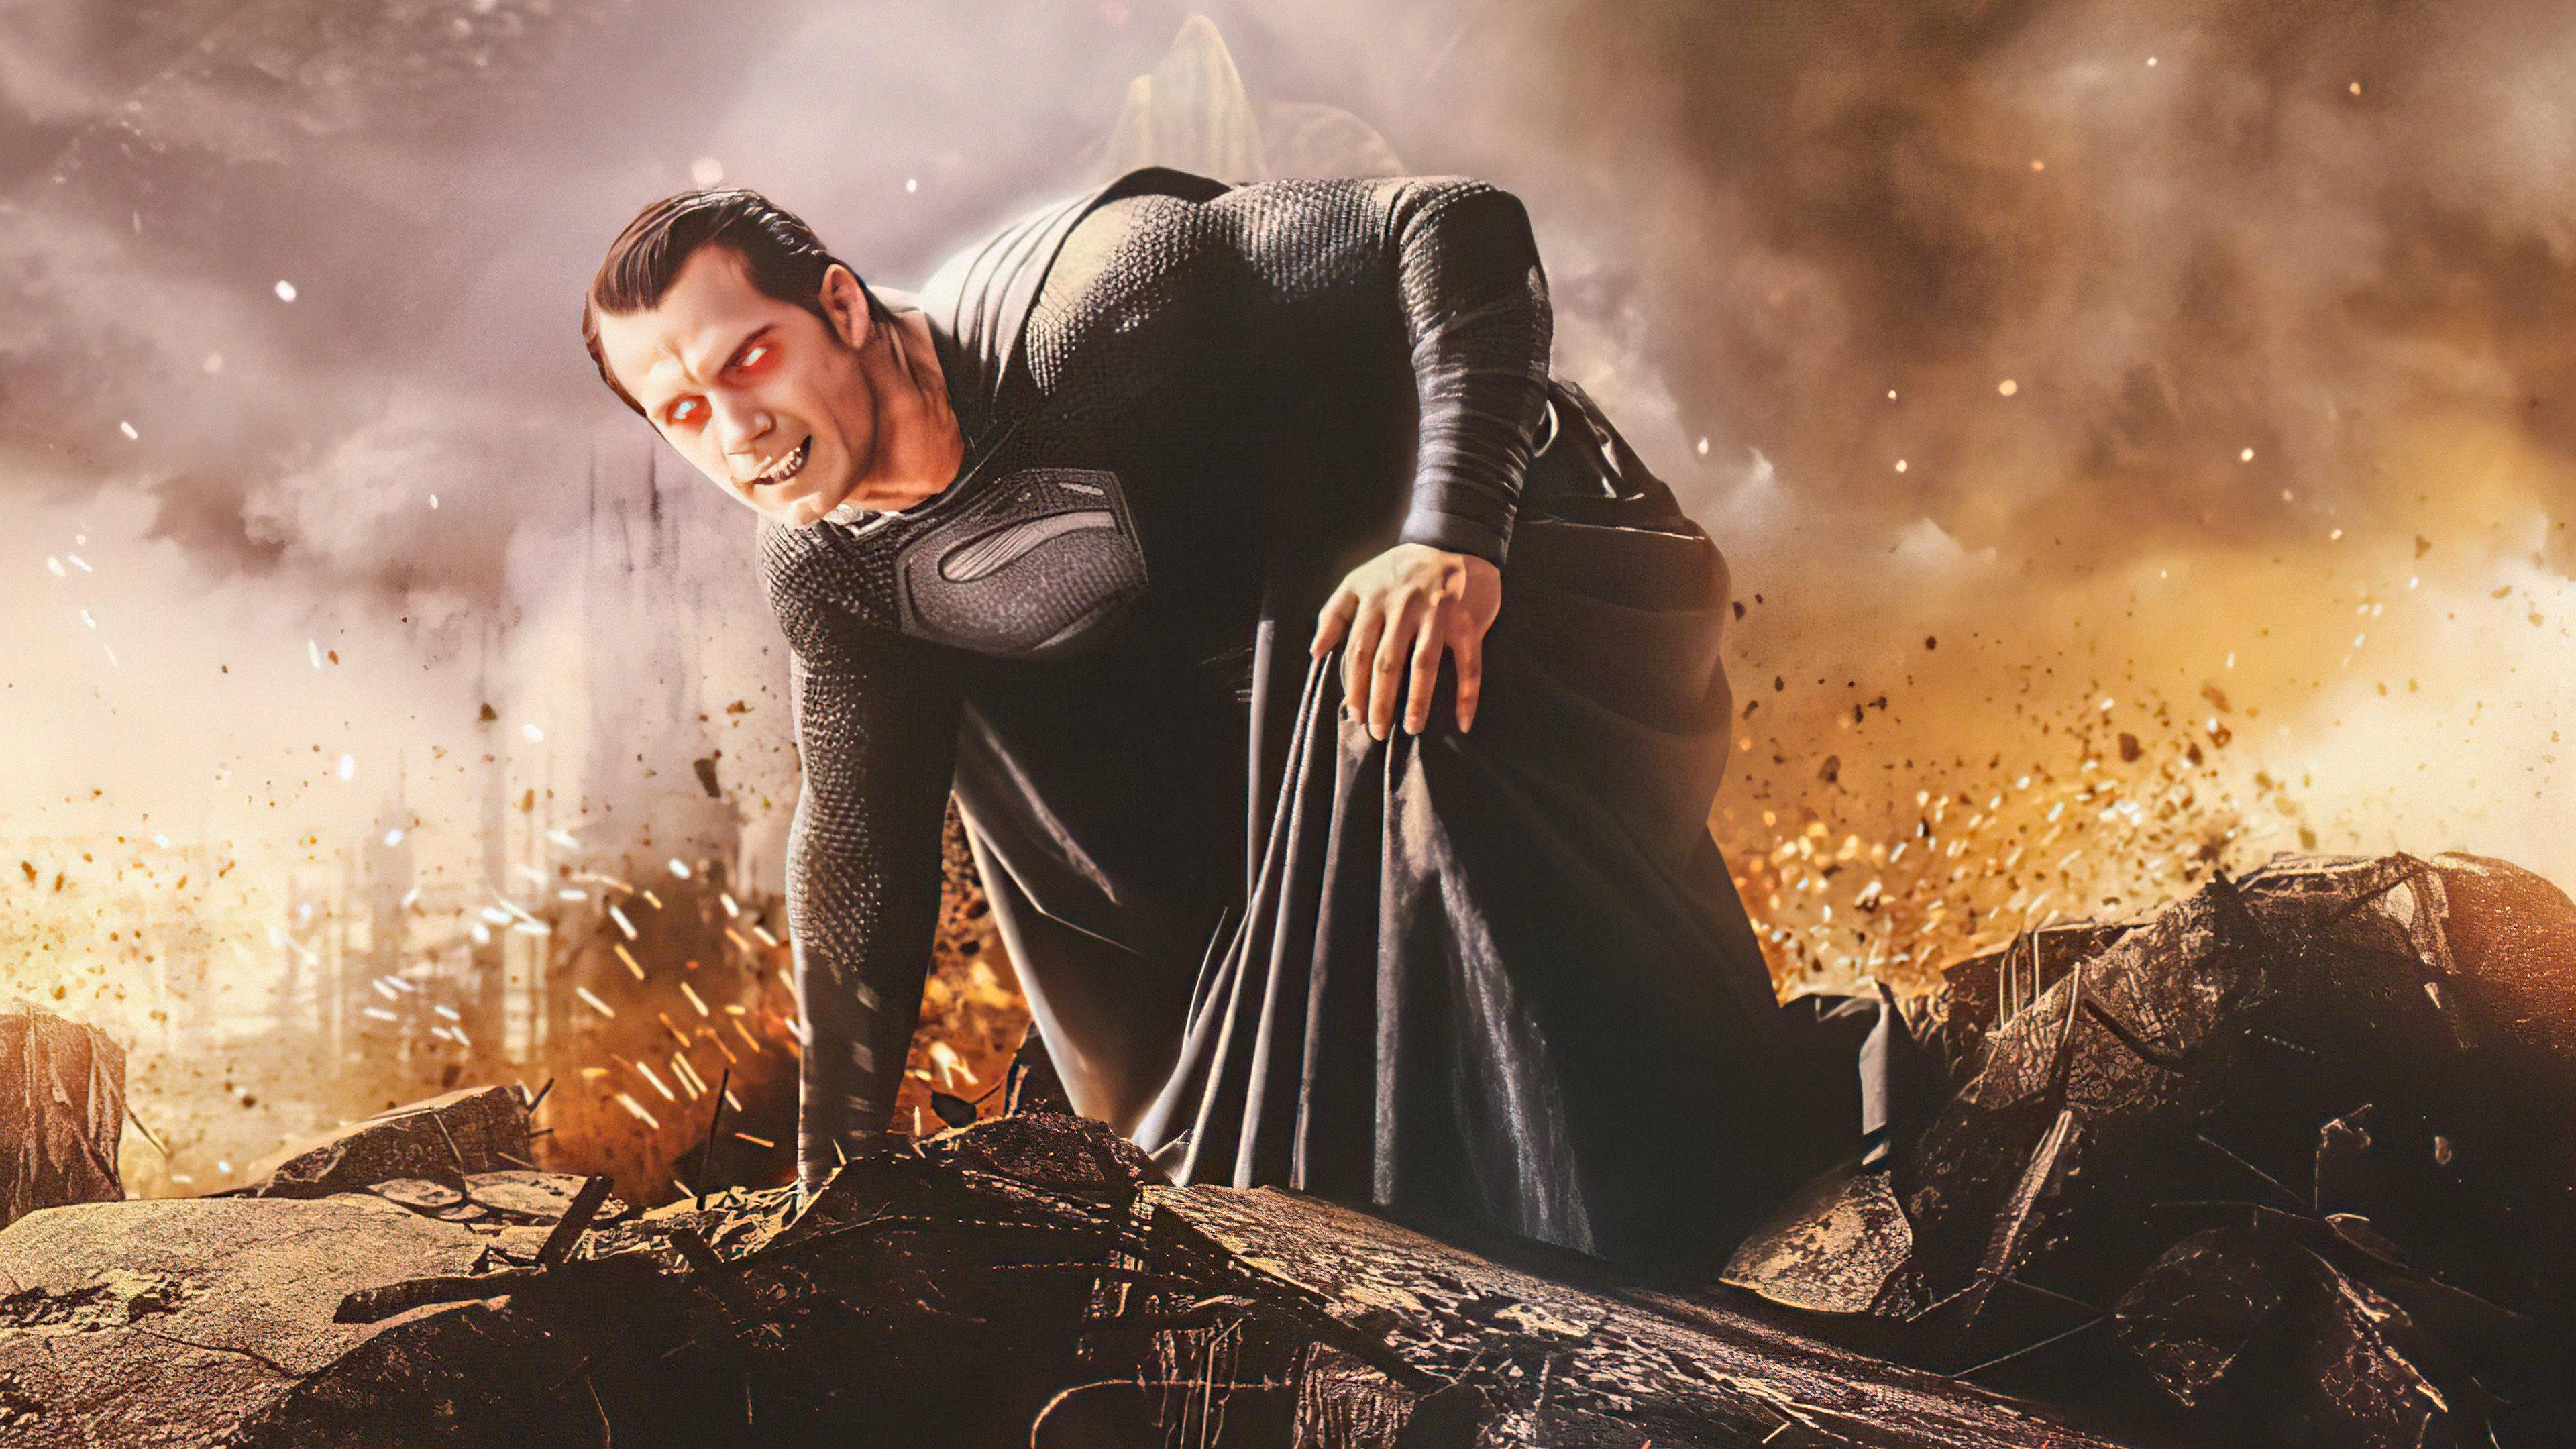 Fondos de pantalla Superman Snyder cut